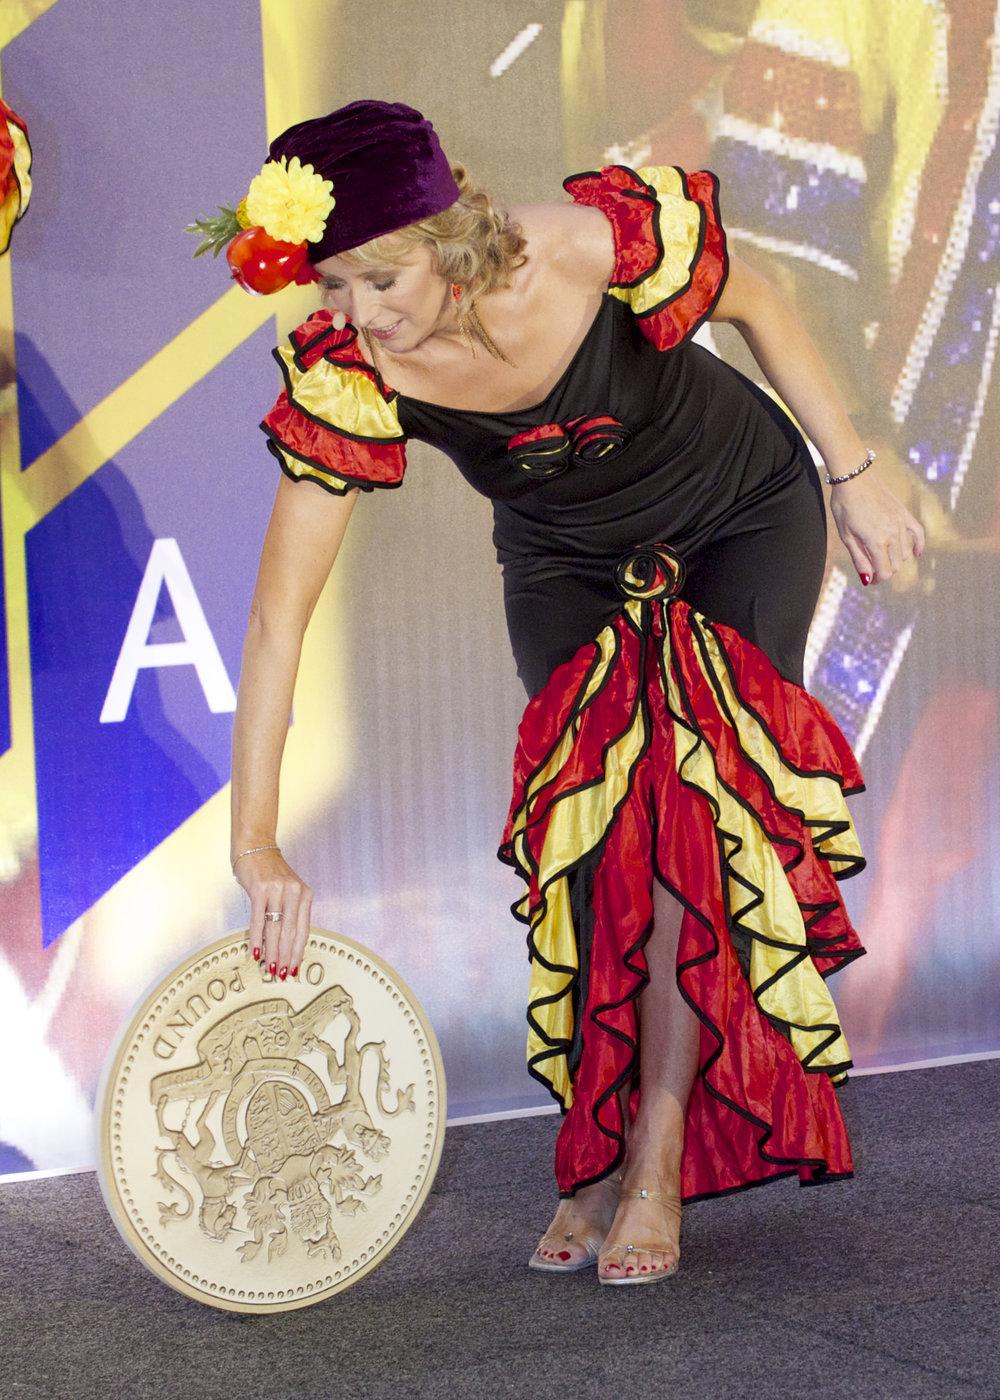 Carmen spin coin.jpg